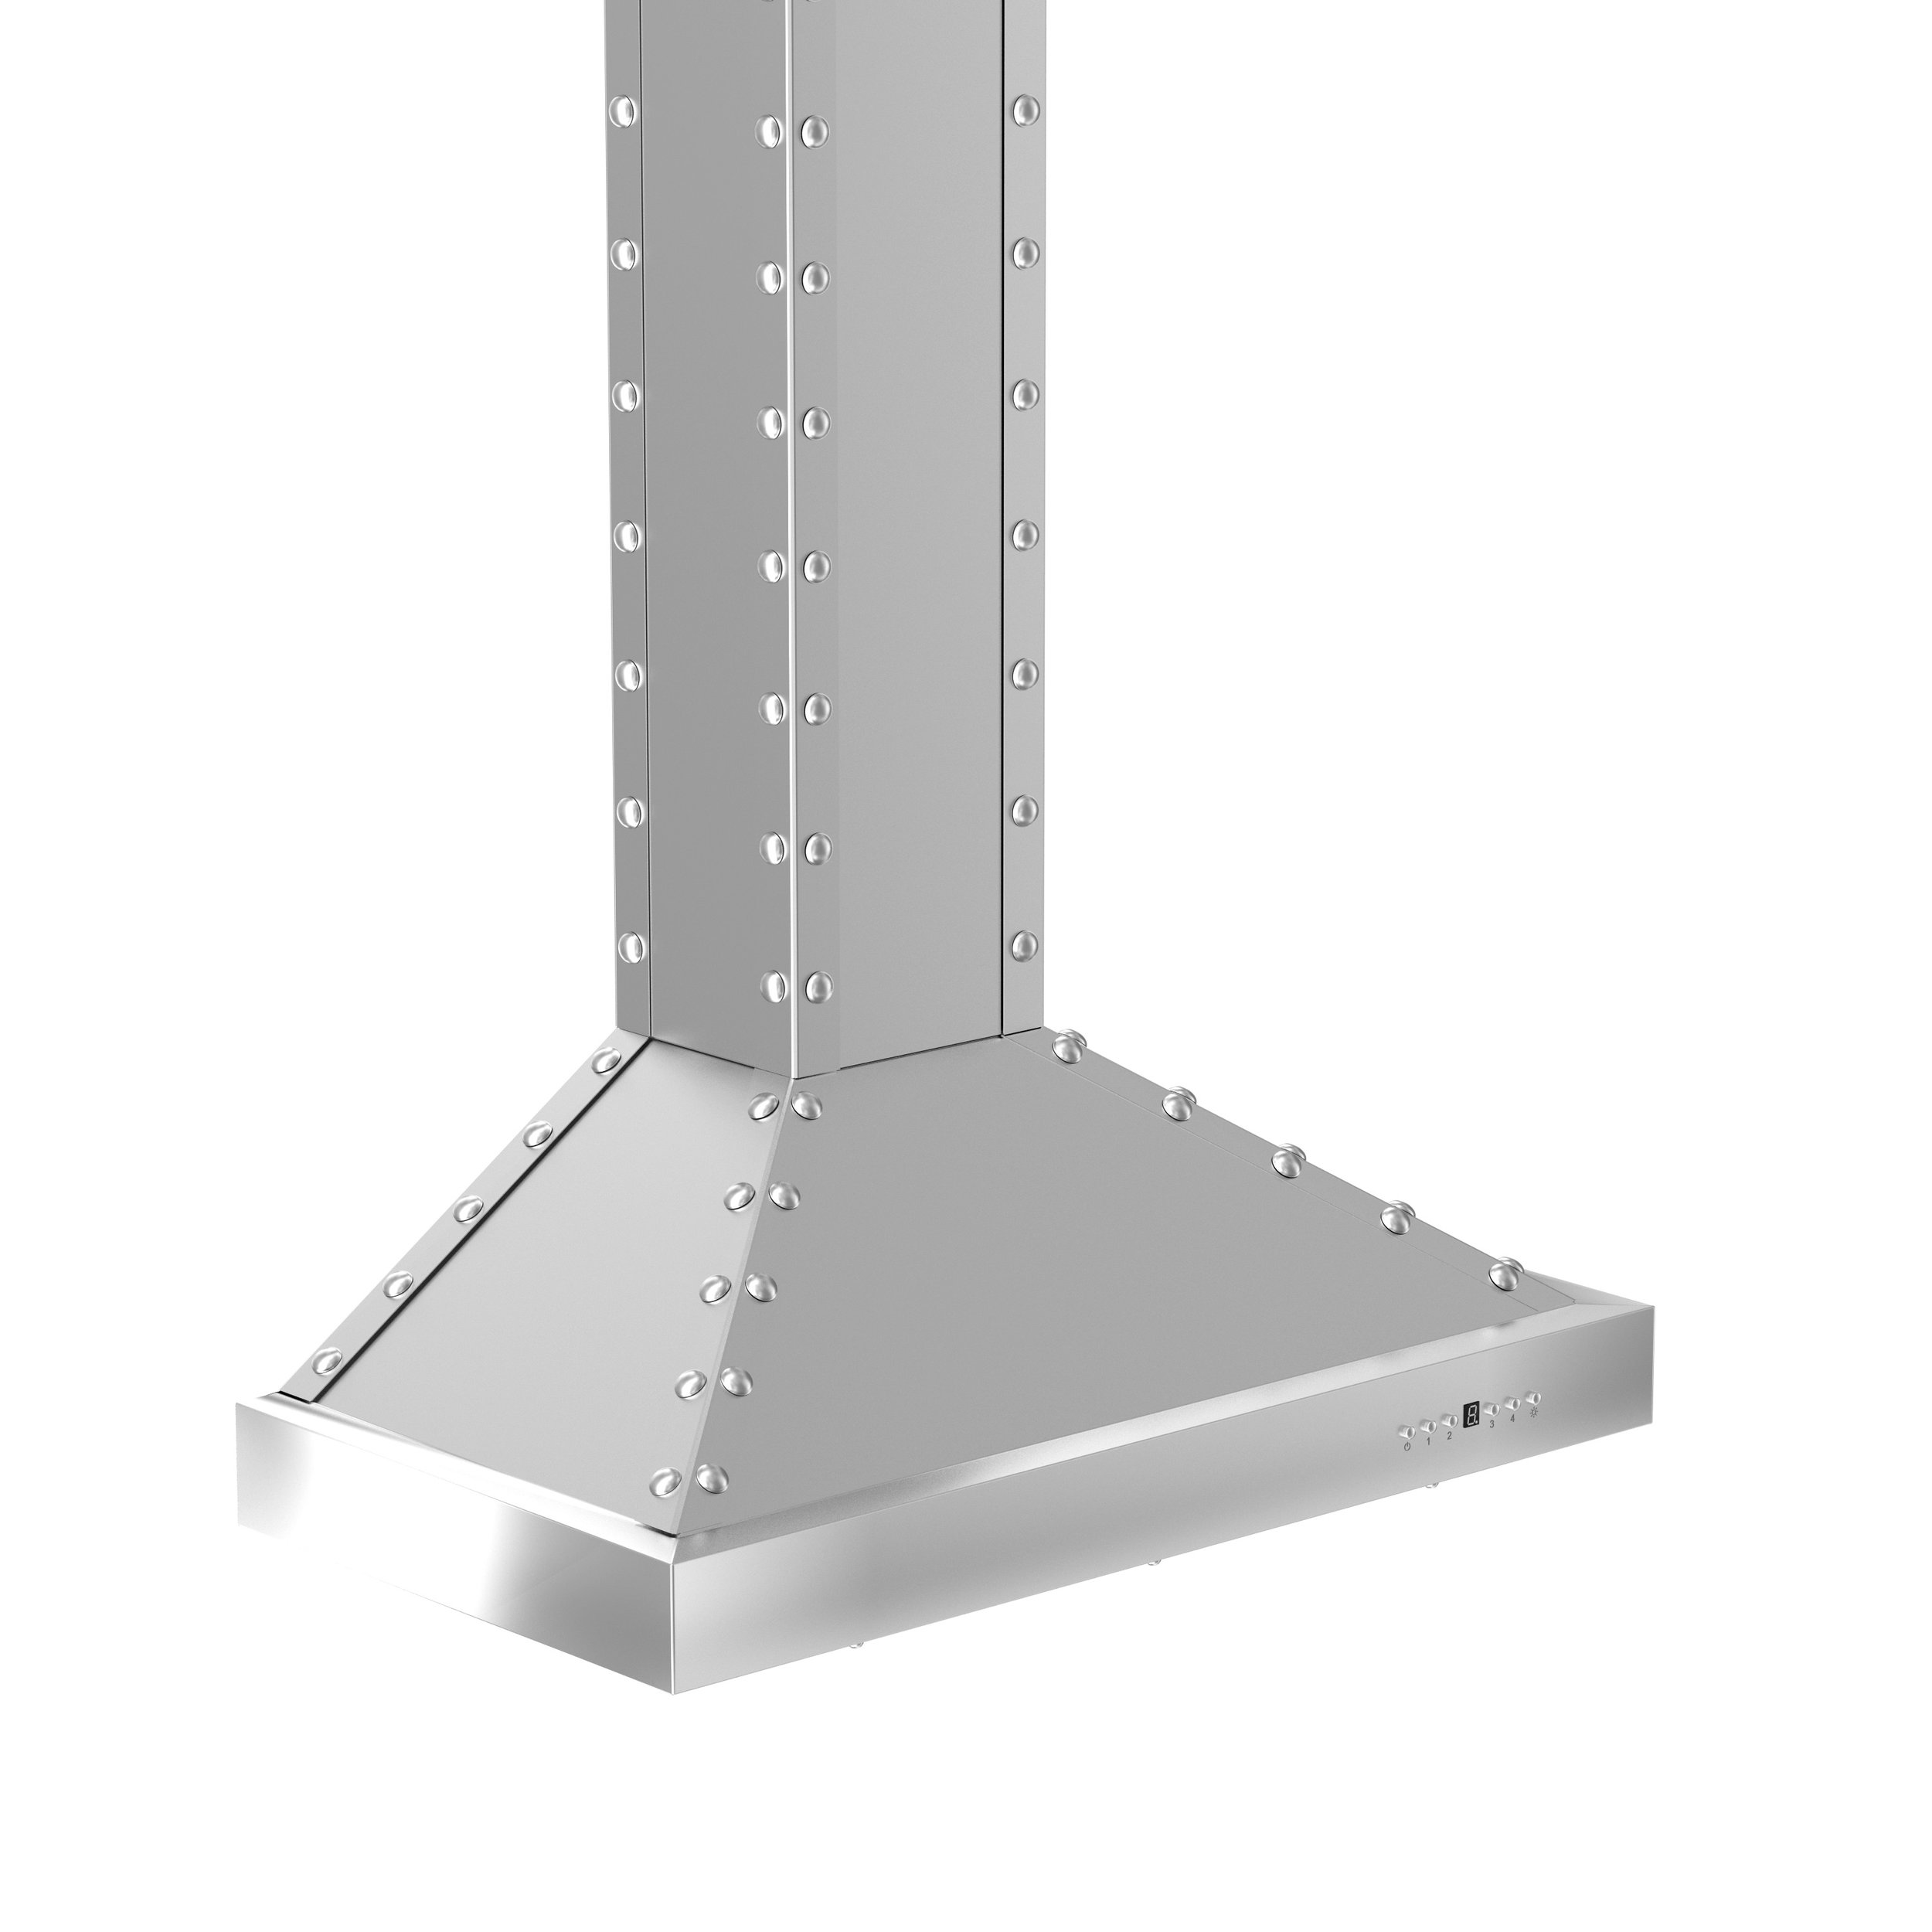 zline-stainless-steel-wall-mounted-range-hood-KB2-4SSXS-top.jpeg